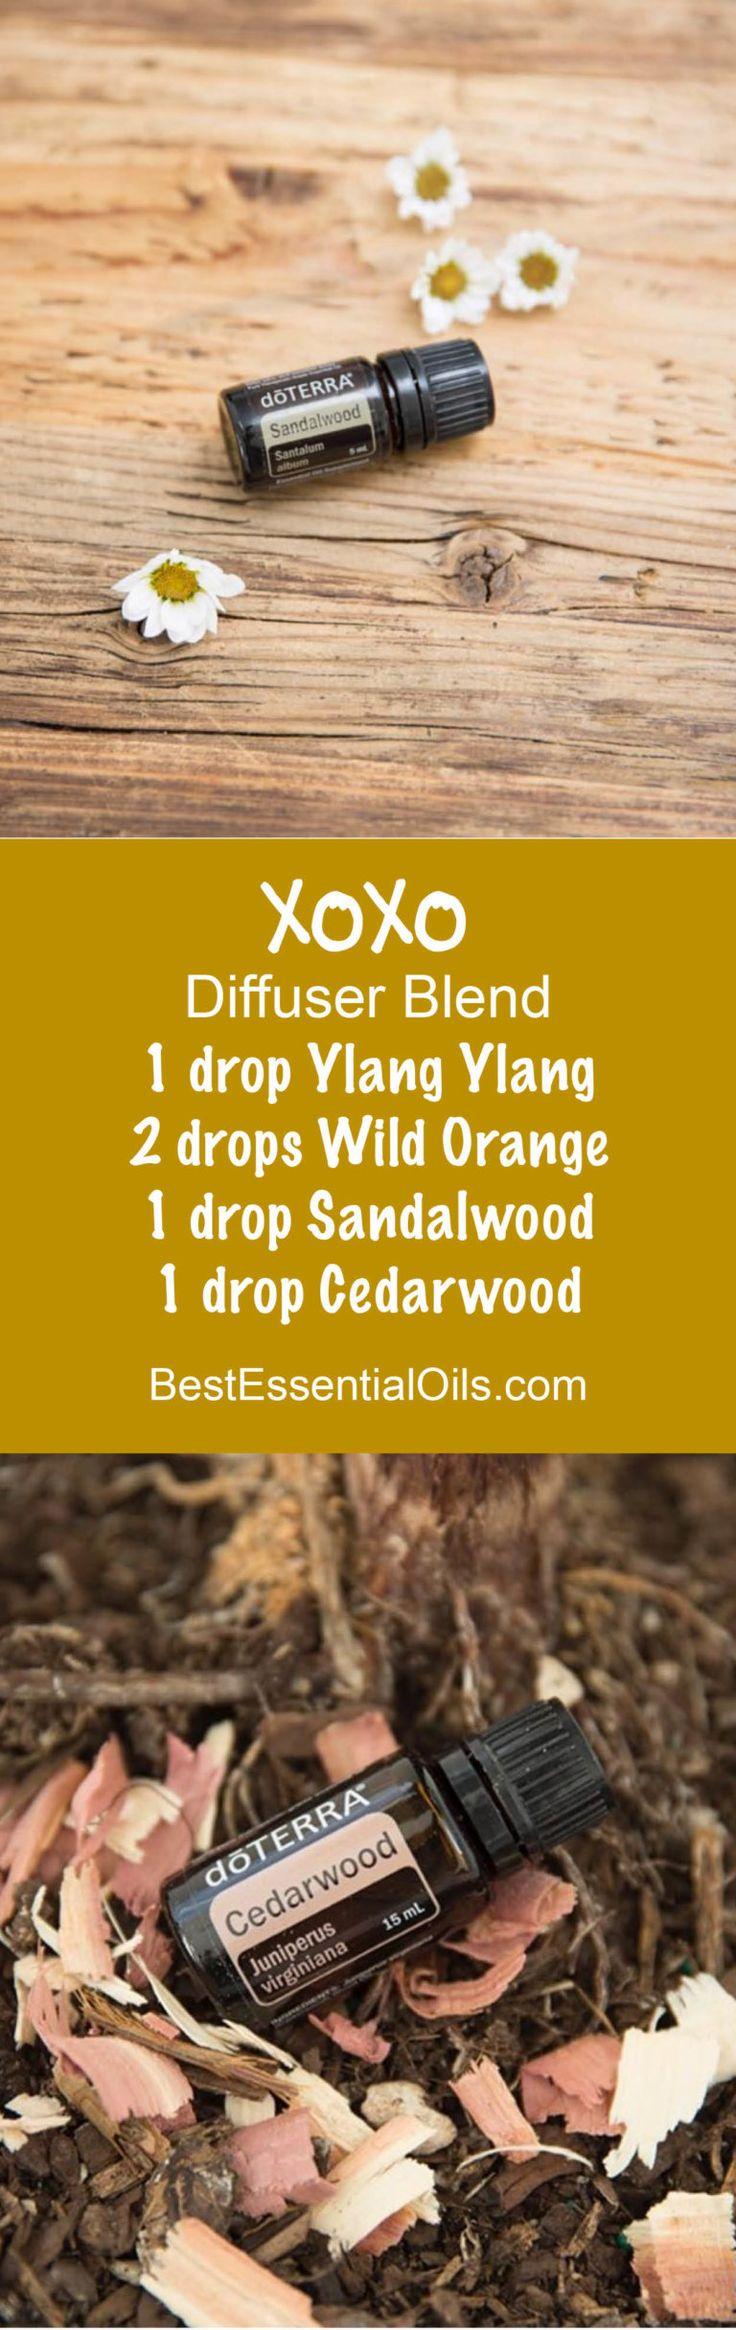 doTERRA Essential Oils XOXO Diffuser Blend